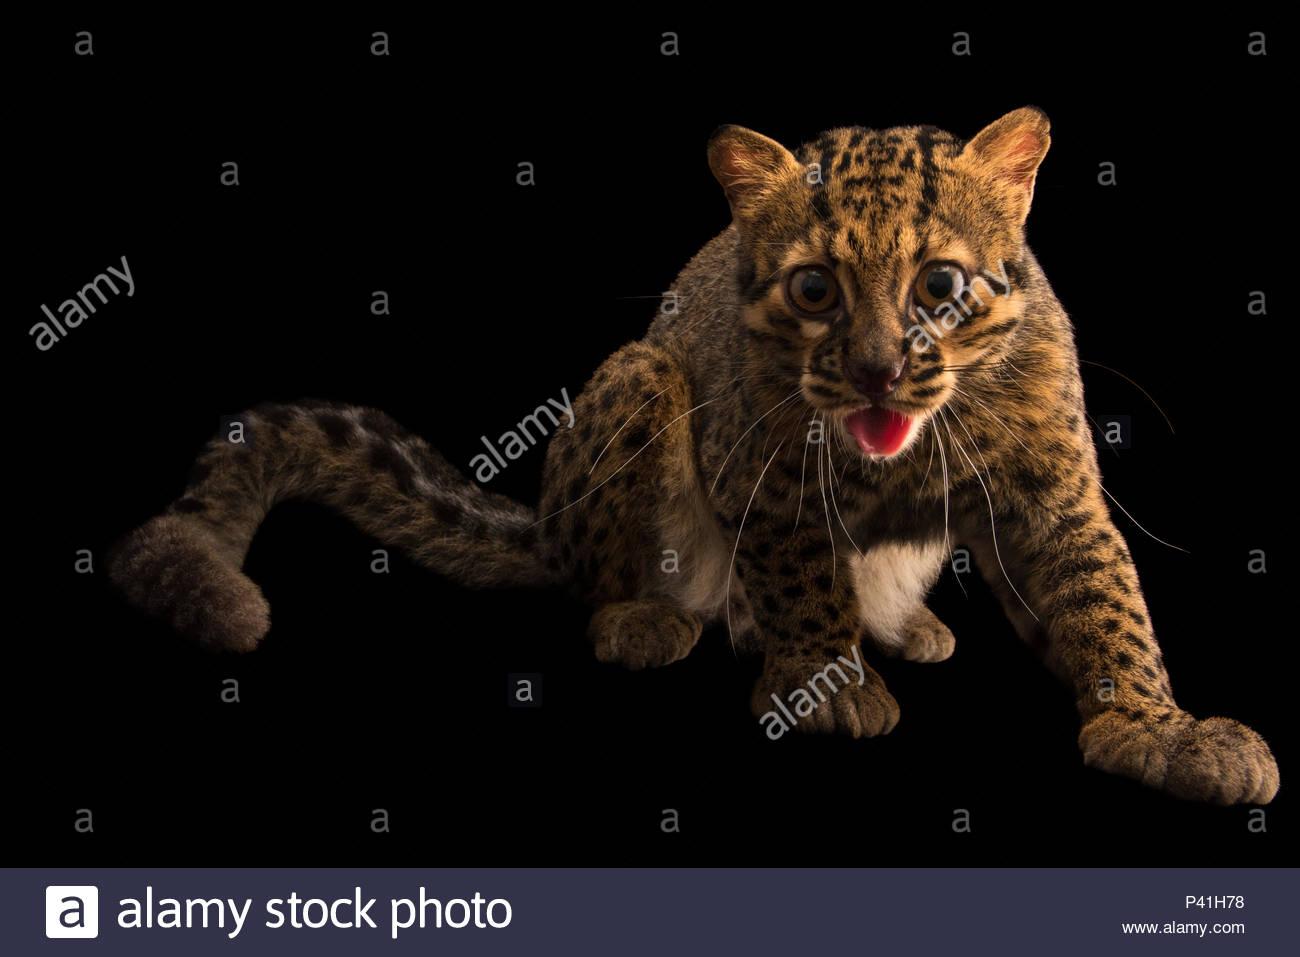 A portrait of a marbled cat, Pardofelis marmorata. - Stock Image